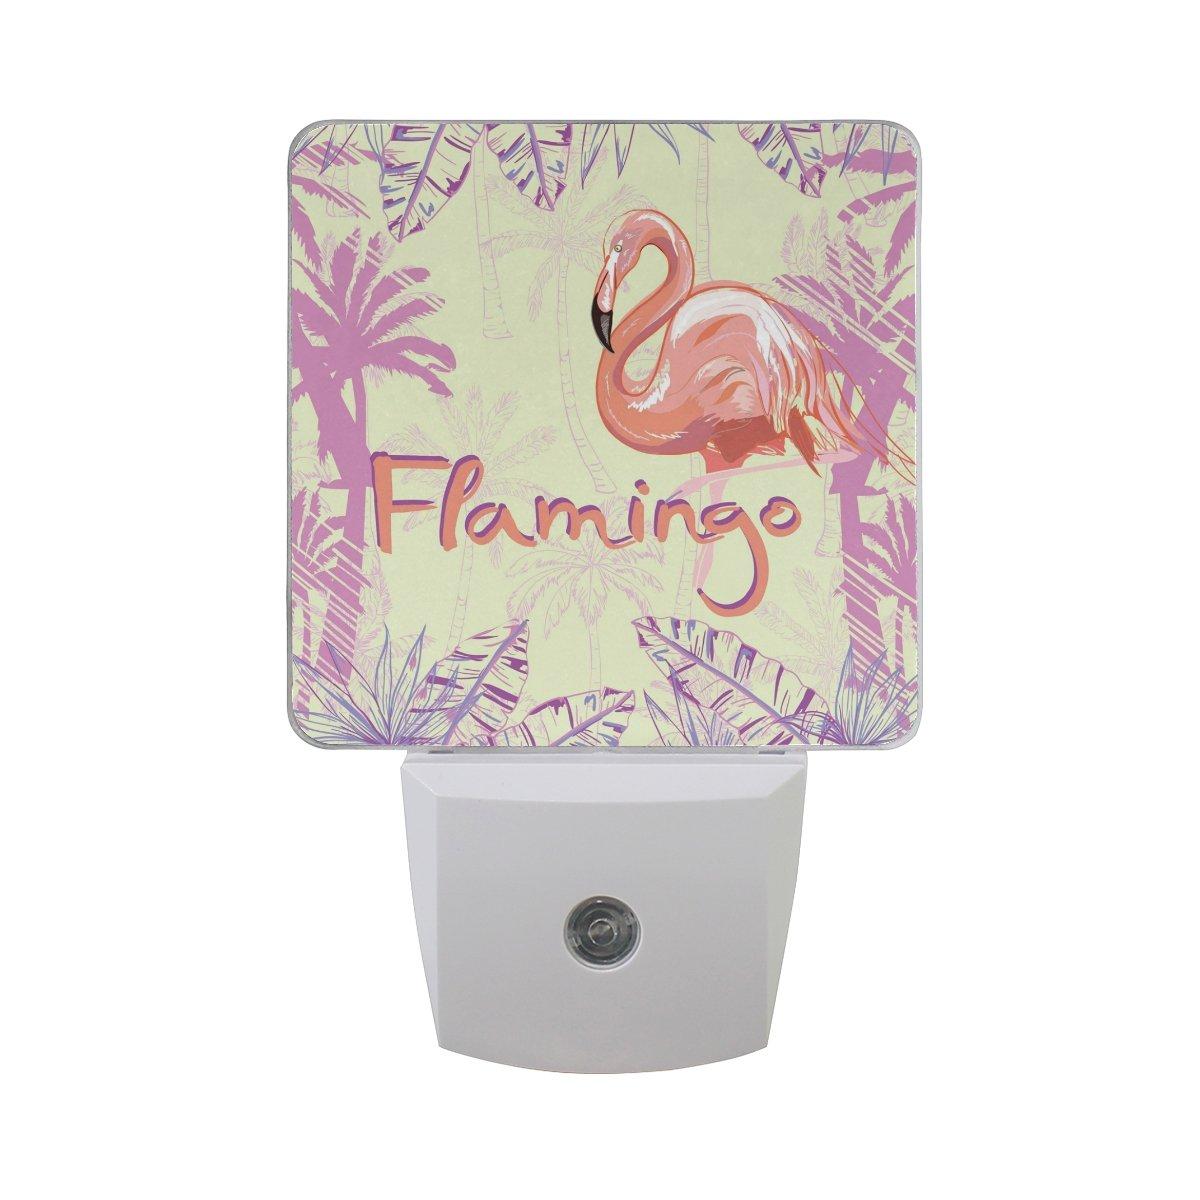 JOYPRINT Led Night Light Tropical Flamingo Palm Tree Leaves, Auto Senor Dusk to Dawn Night Light Plug in for Kids Baby Girls Boys Adults Room by JOYPRINT